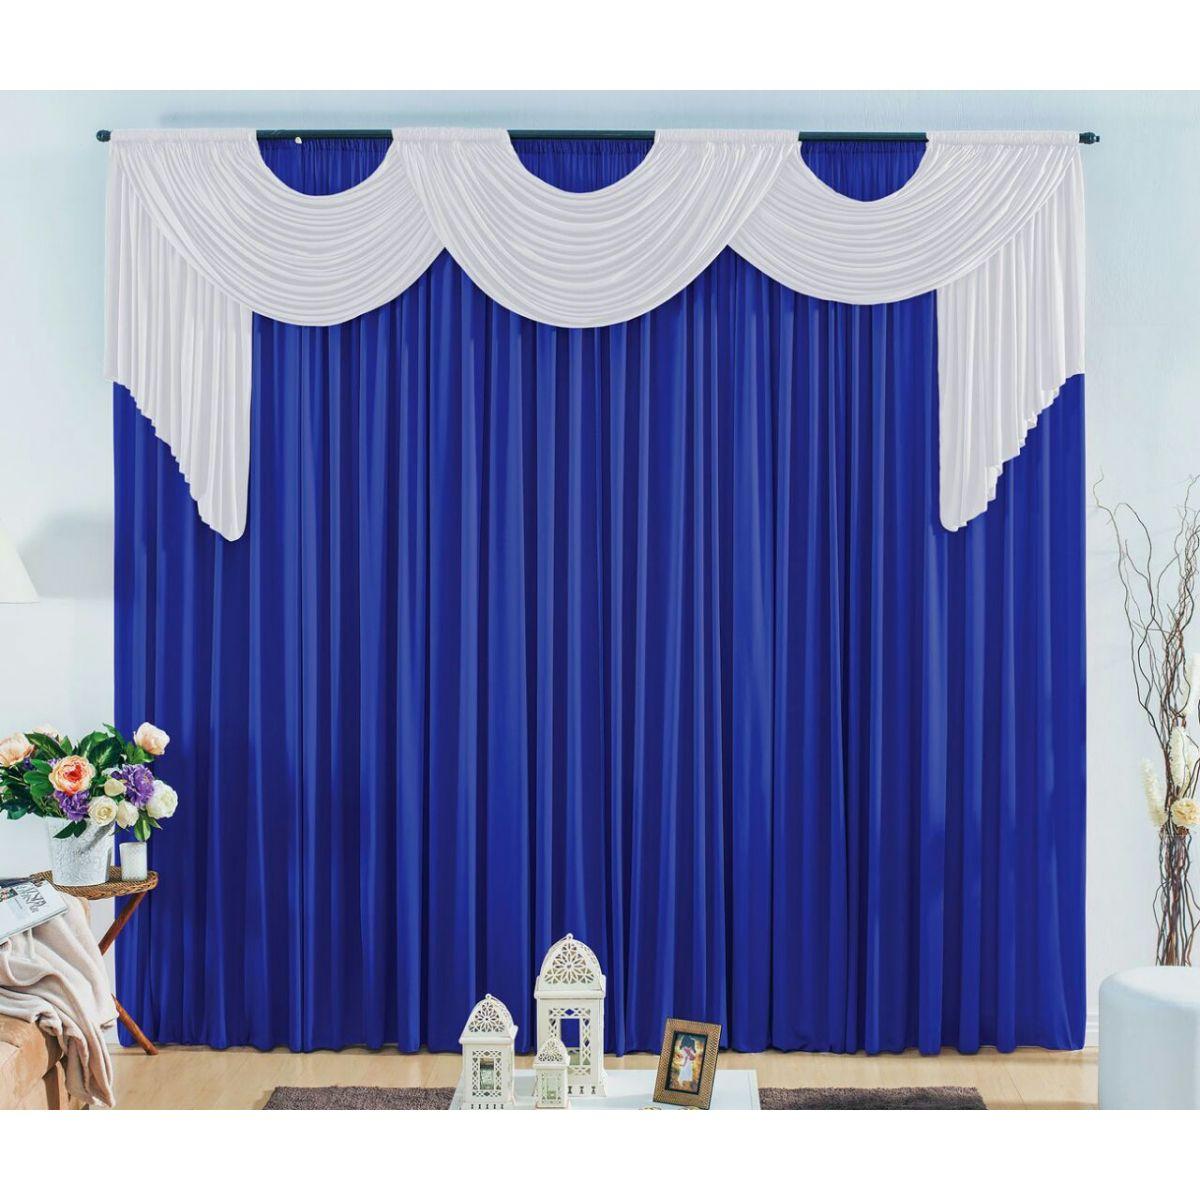 Cortina London tam. 3,00 x 2,80 metros -Cor Azul cobalto com branco